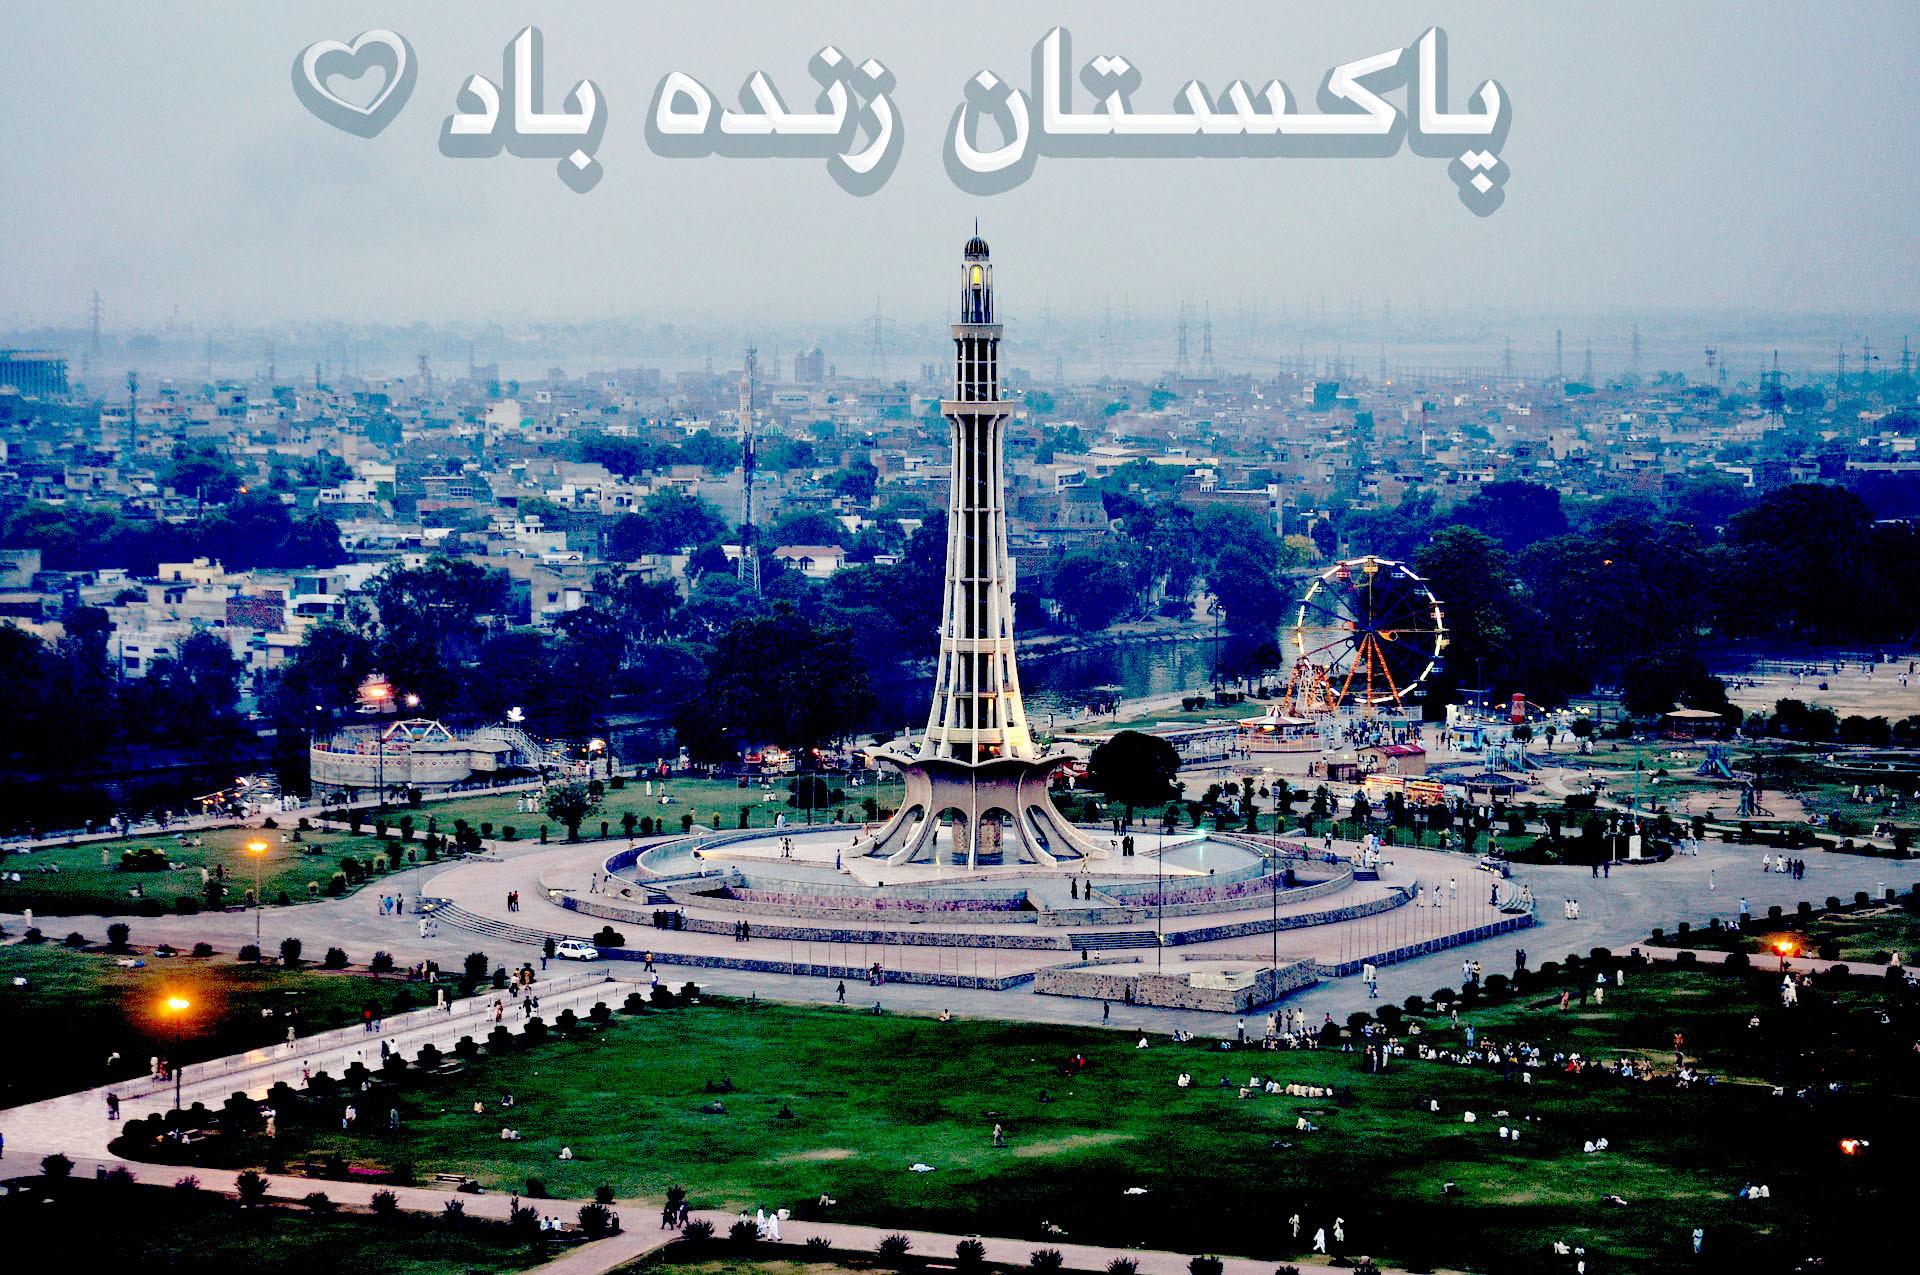 Res: 1920x1275, Minar e Pakistan Wallpaper in Urdu